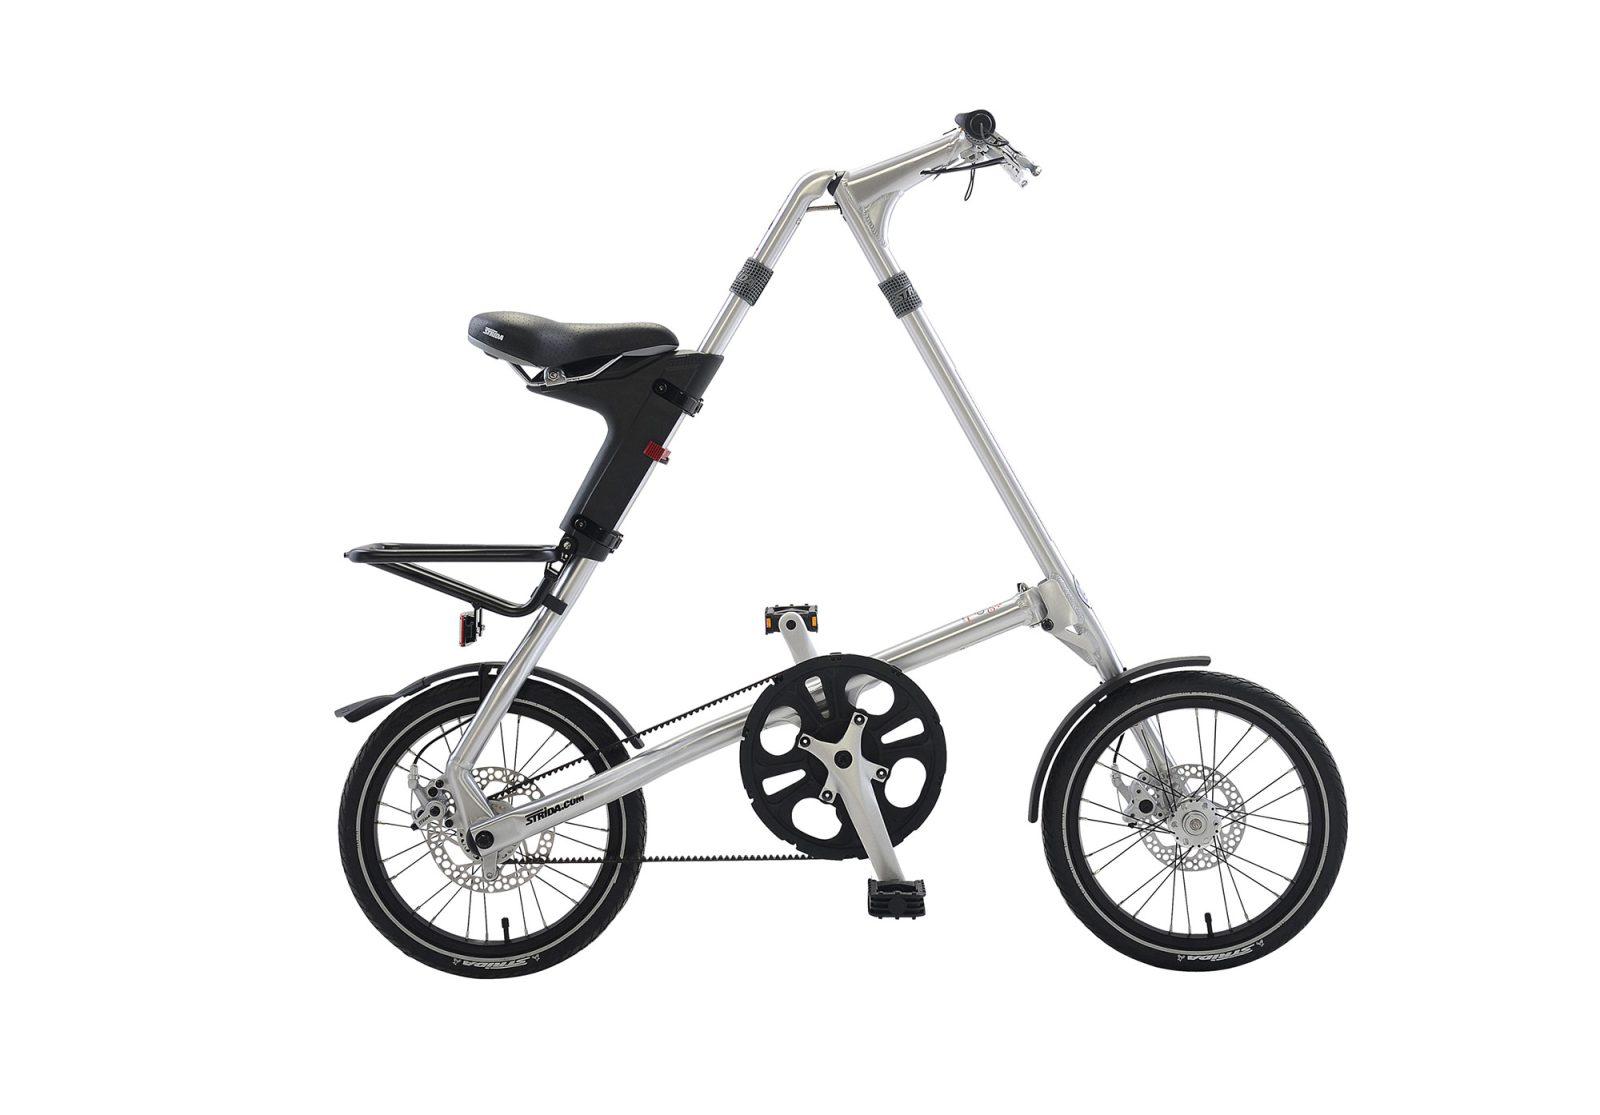 STRiDA 5.0 Folding Urban Bicycle-31728